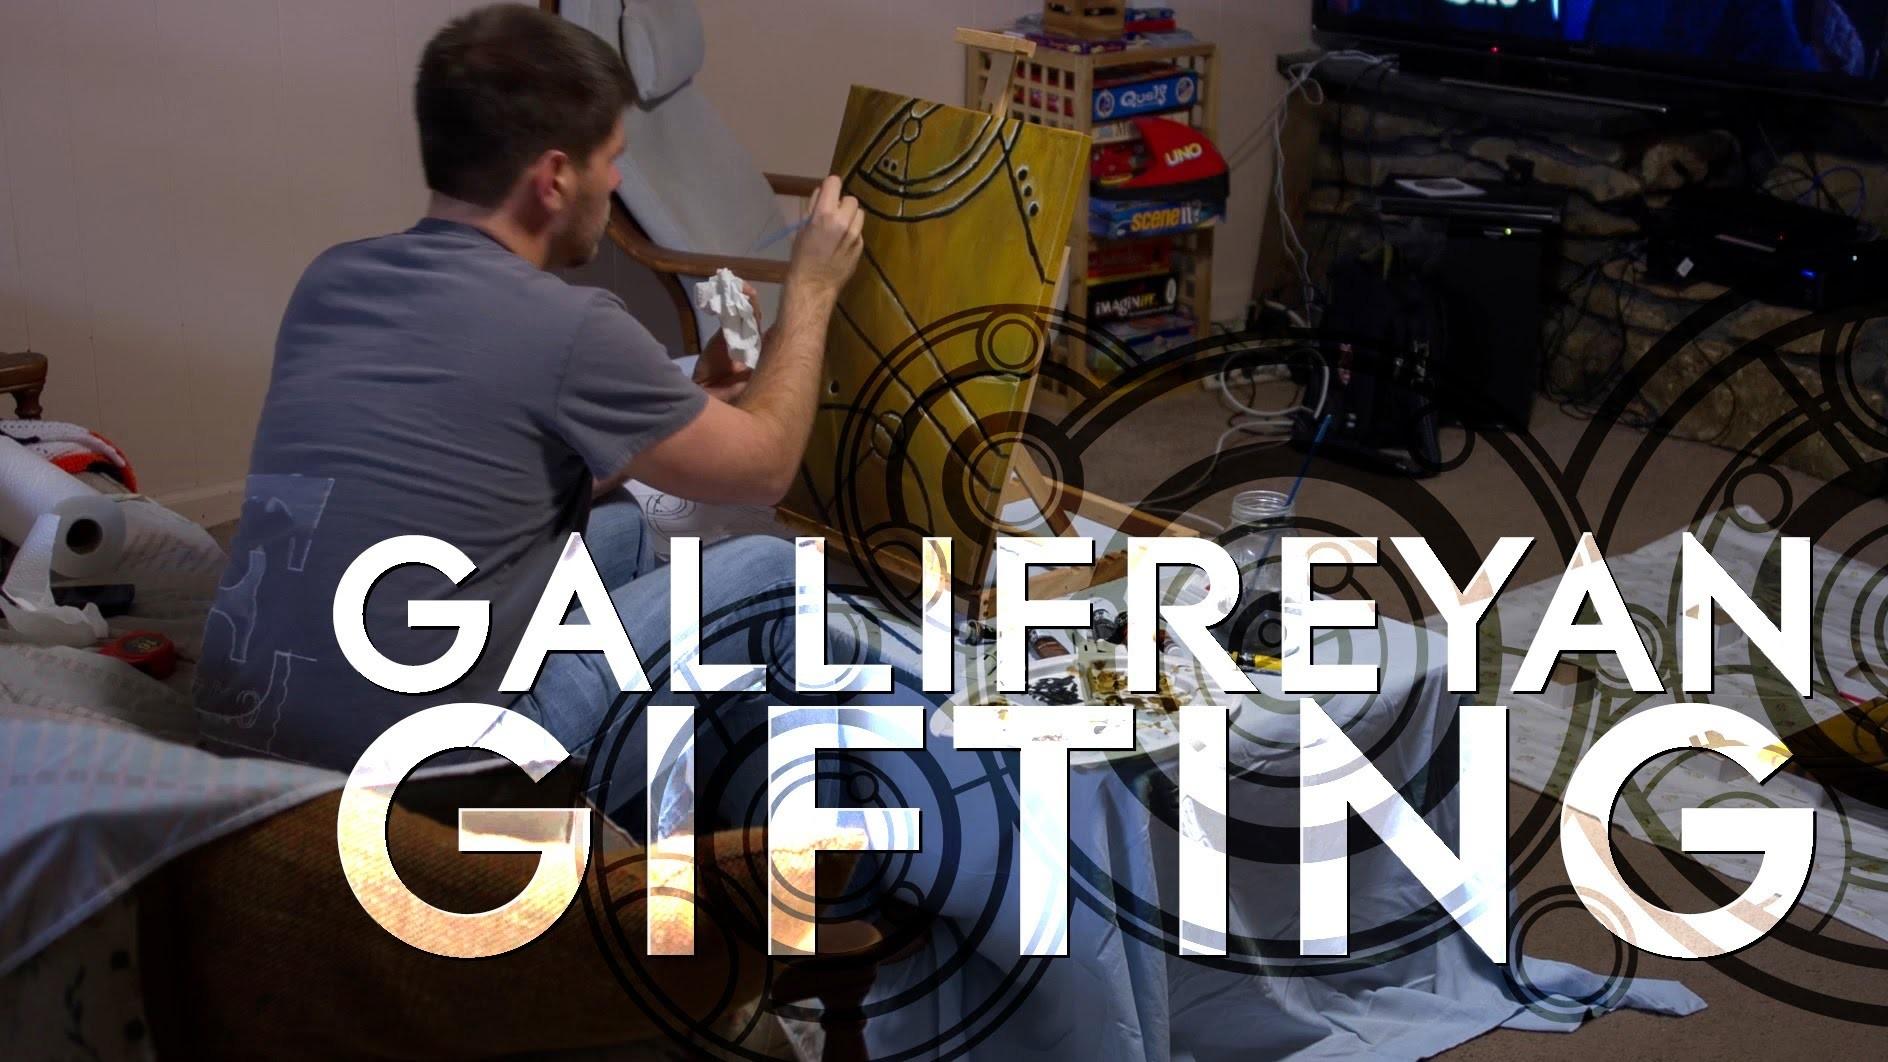 Gallifreyan Gifting - Making Doctor Who Art for My Sister's Christmas Present!